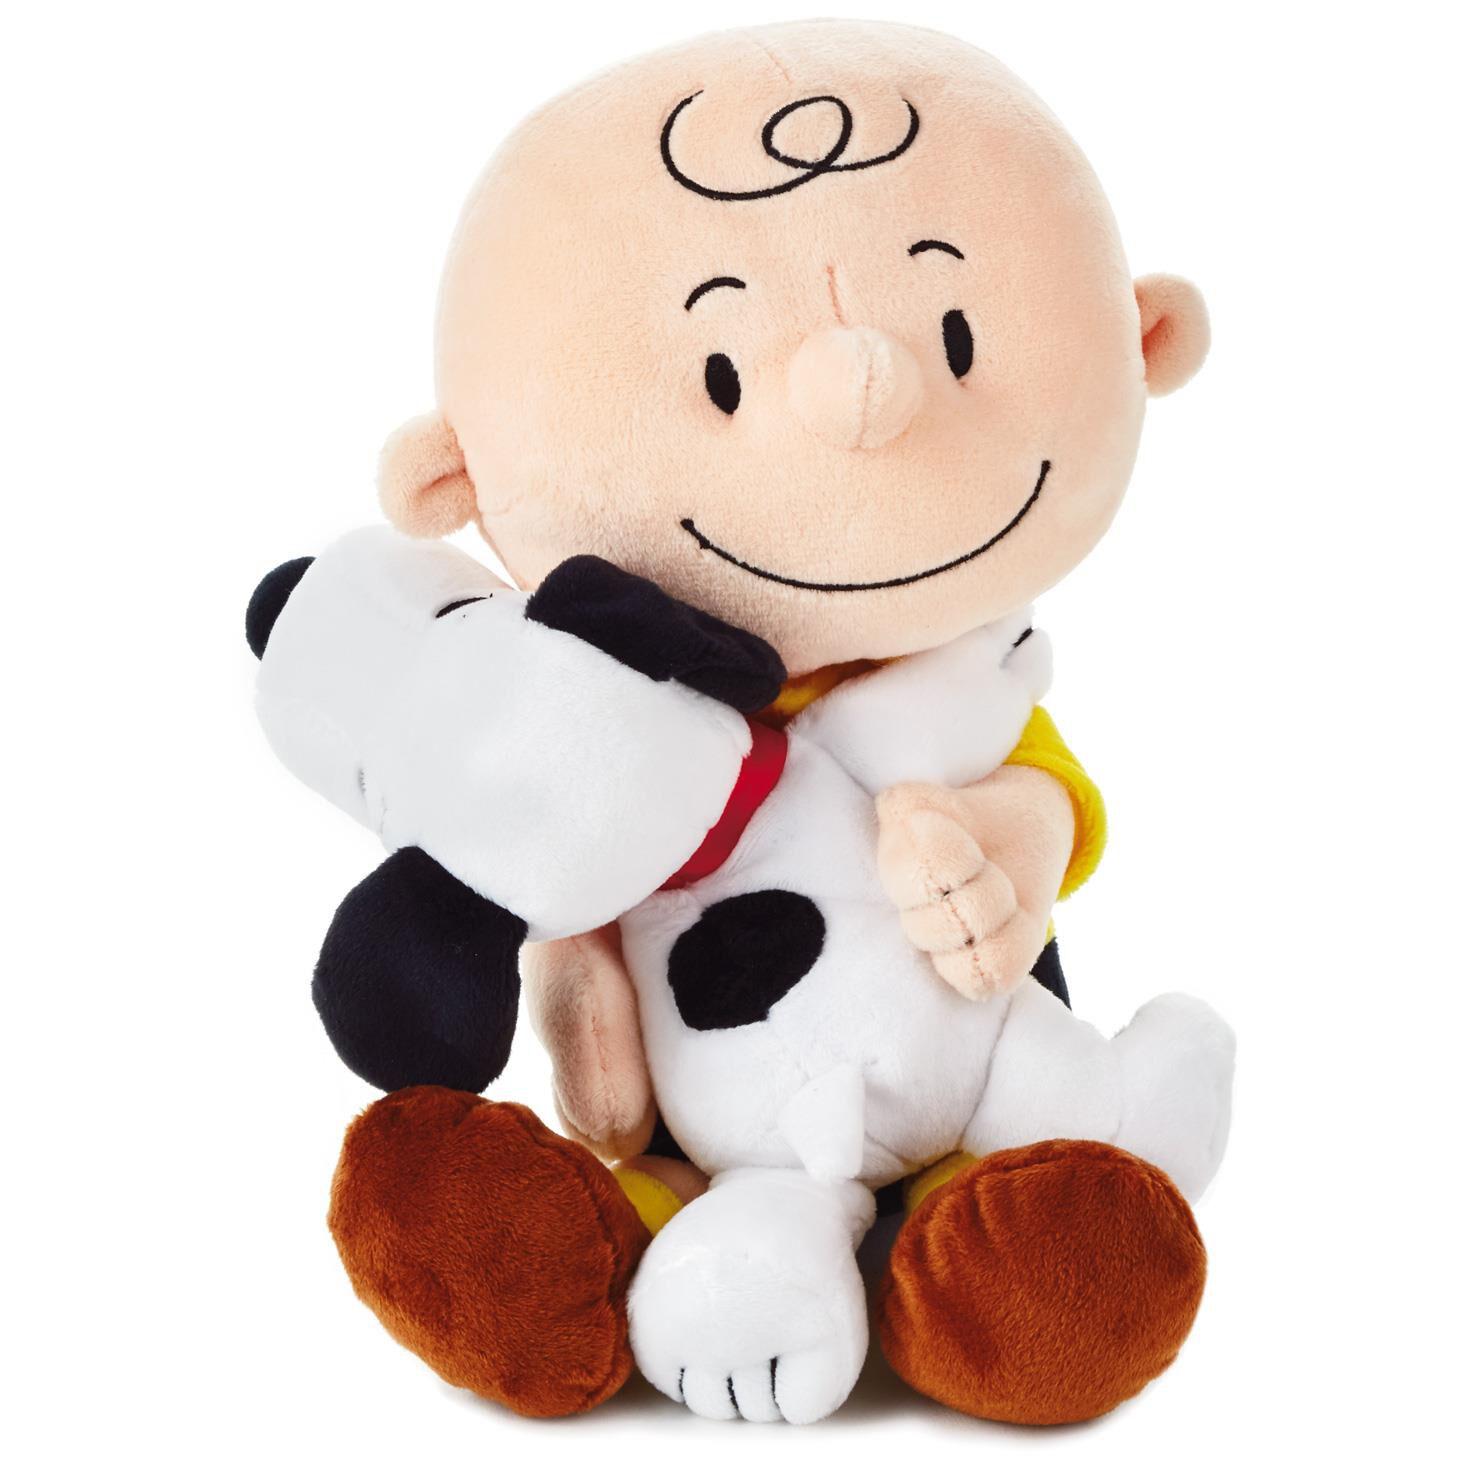 Snoopy Thanksgiving Stuffed Animal Imfuture14